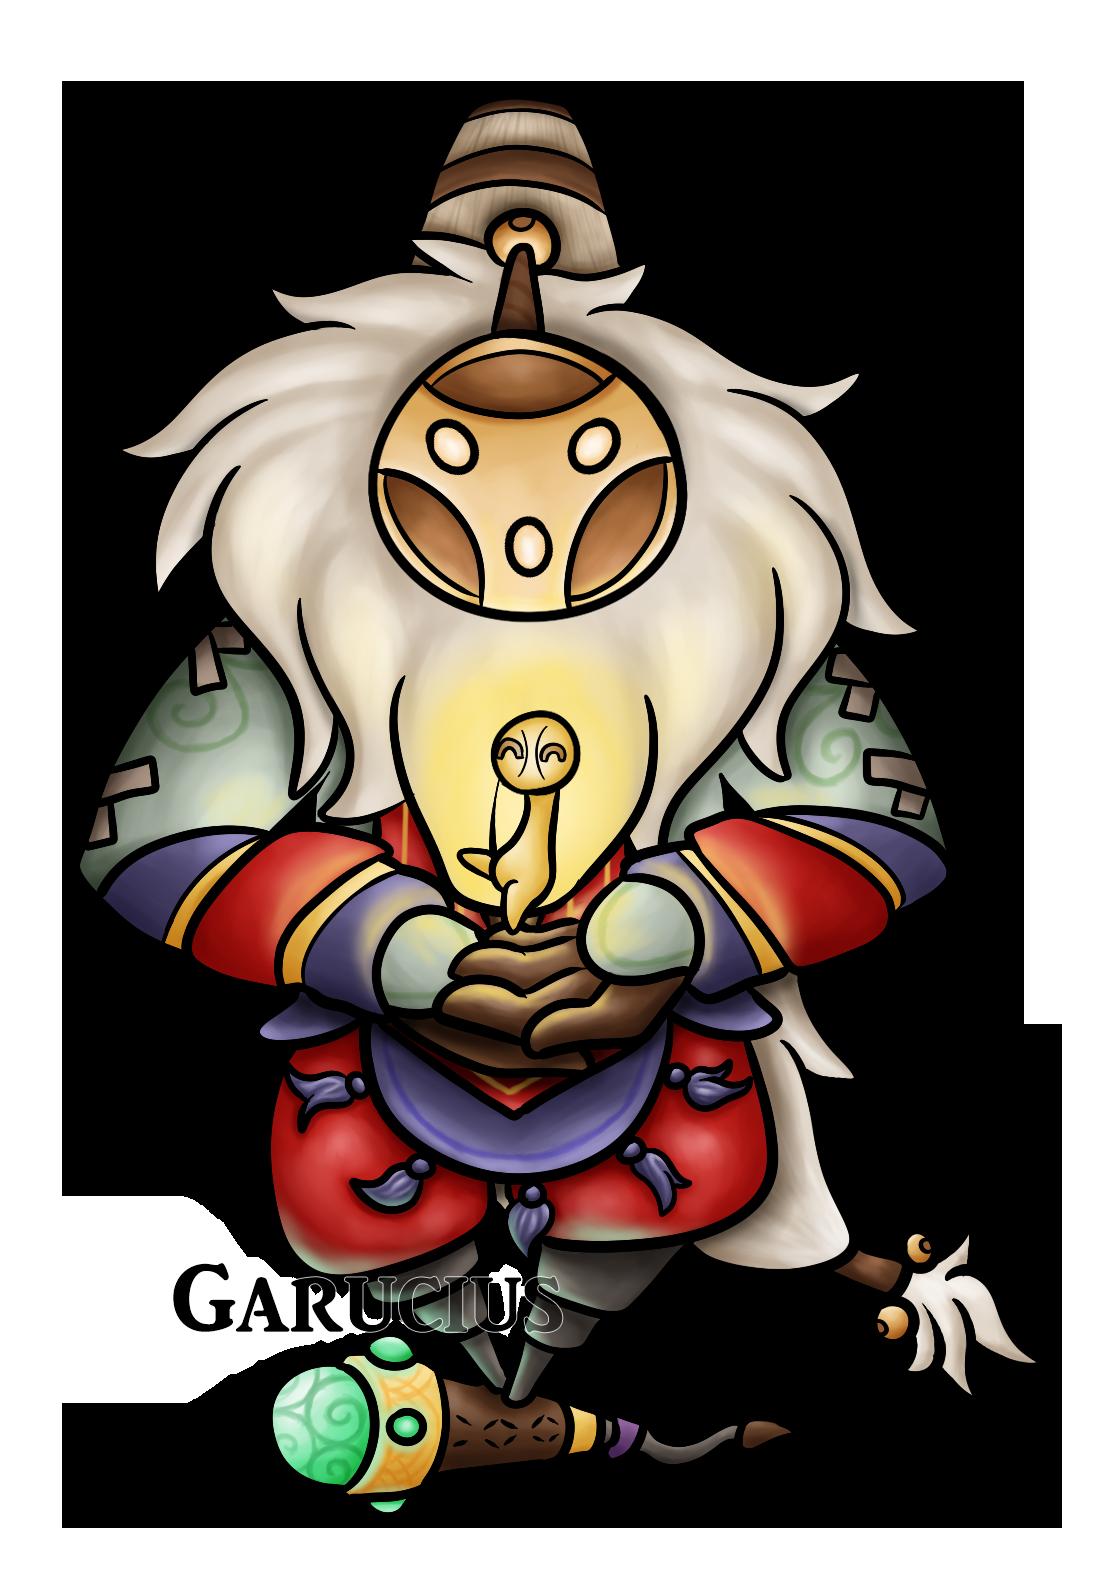 Chibi Bard by Garucius HD Wallpaper Artwork Fan Art League of Legends lol  (2)